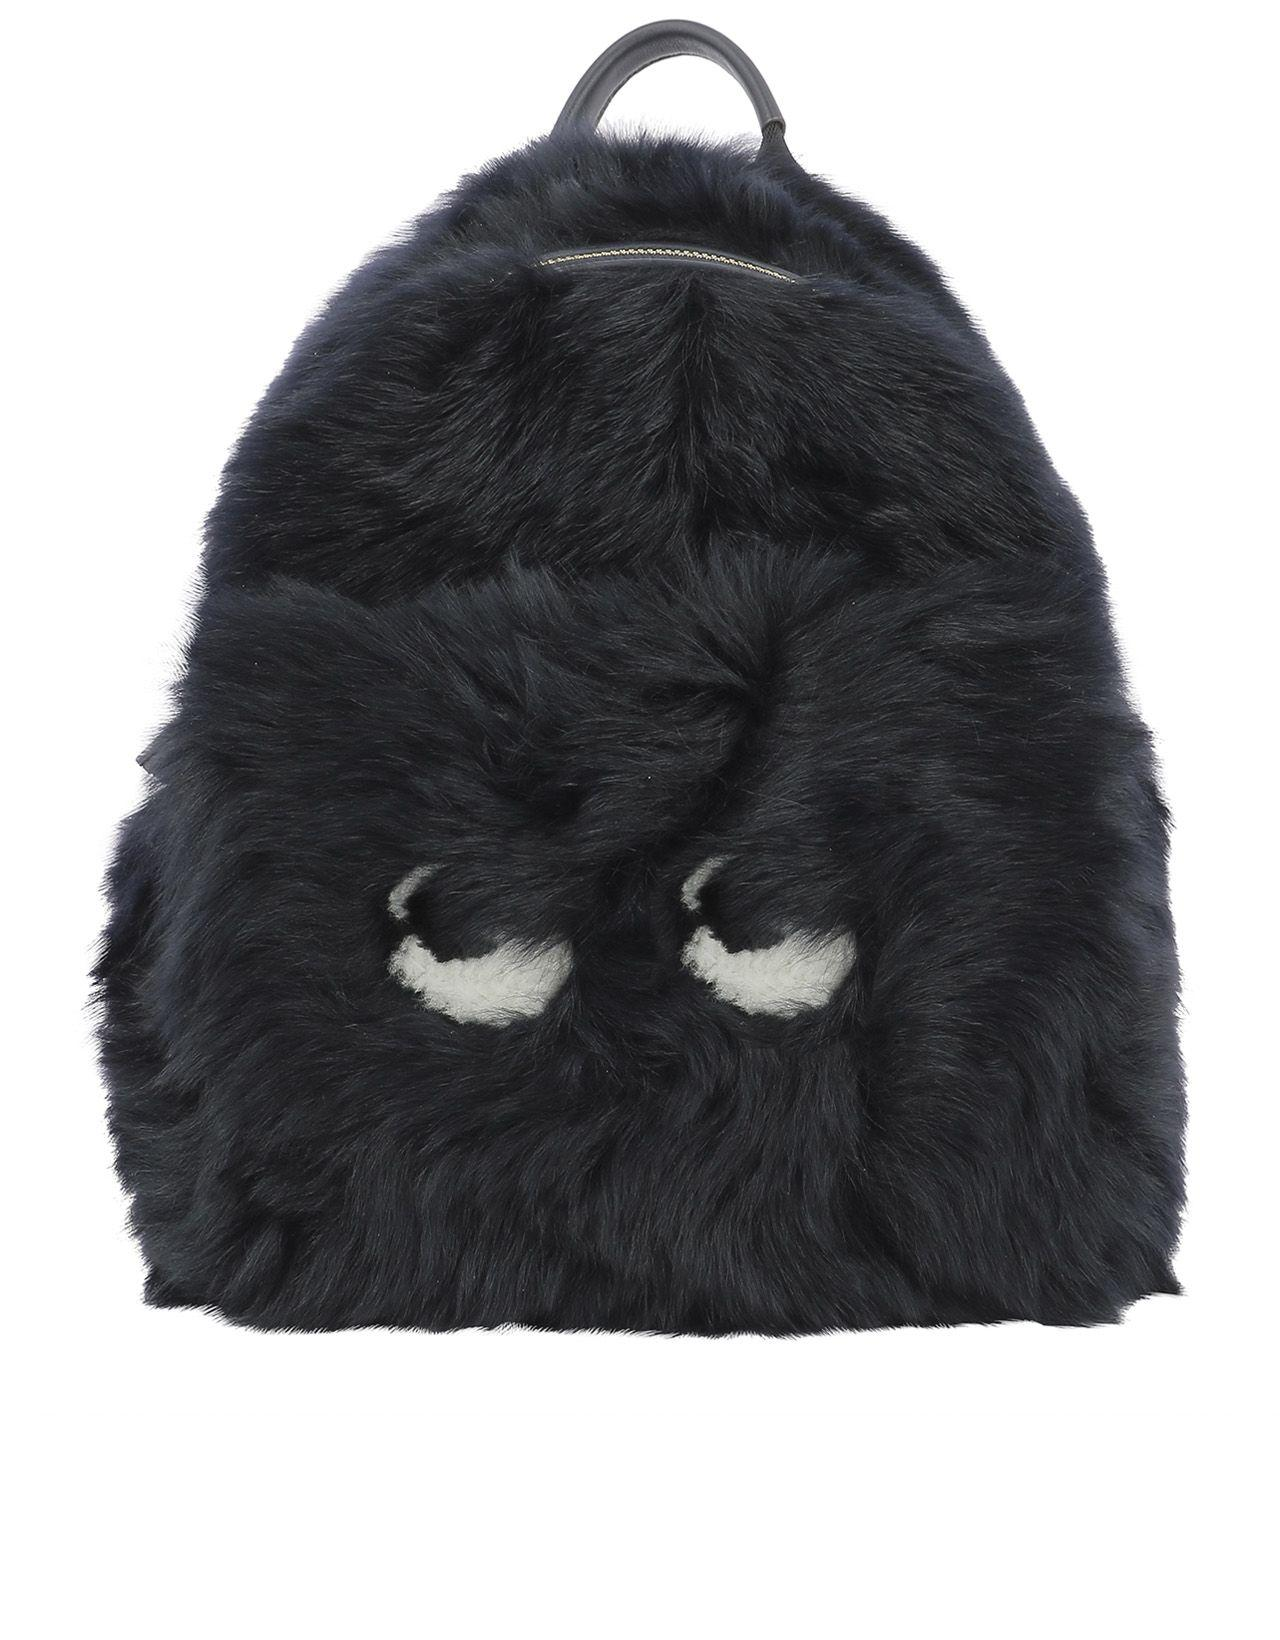 Anya Hindmarch Dark Blue Fur Backpack